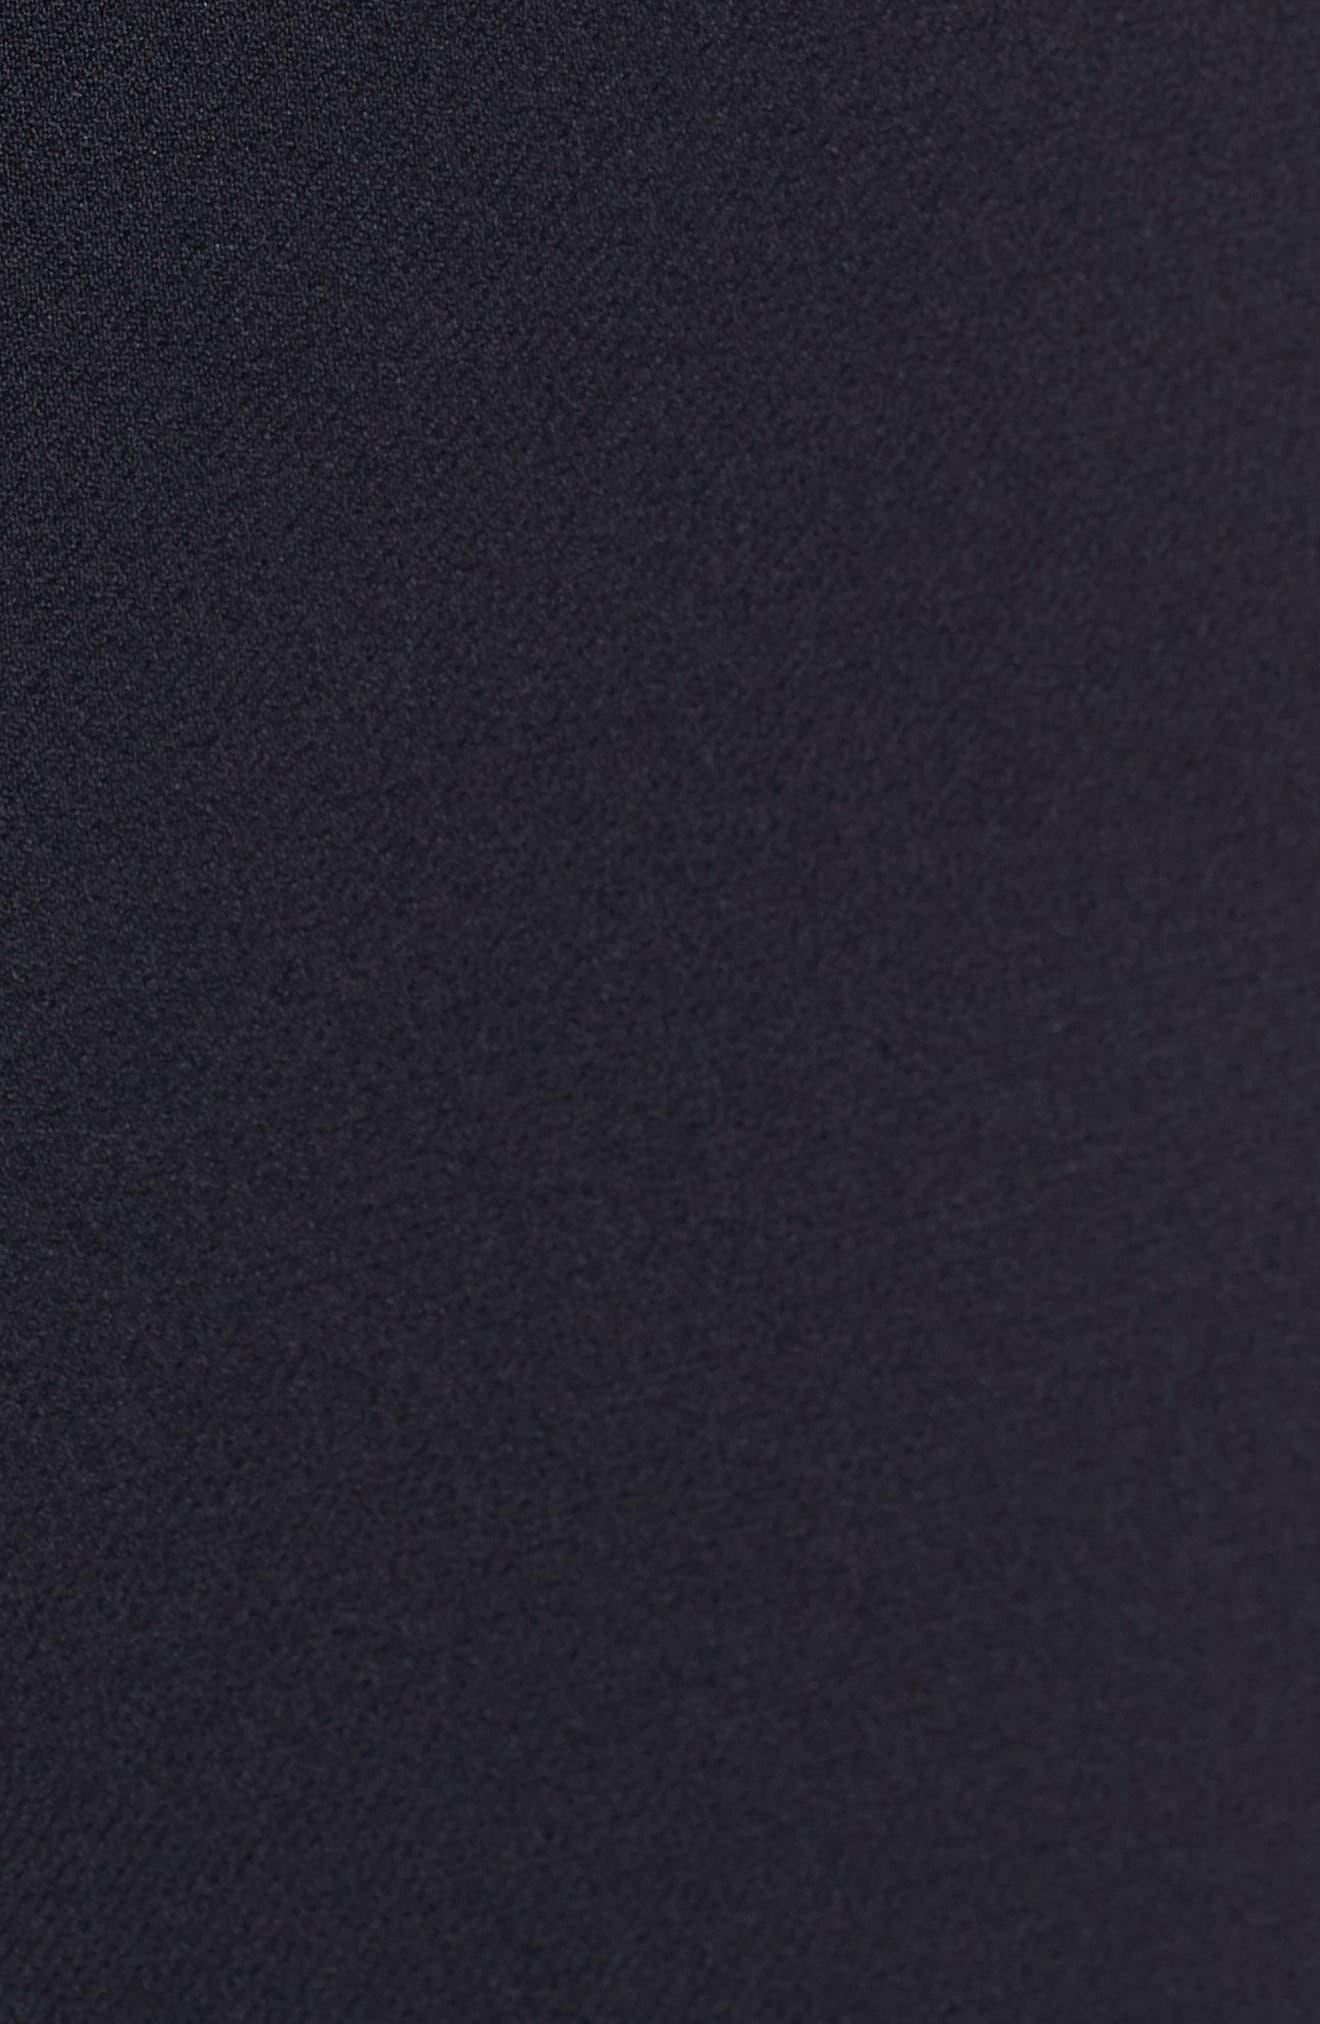 Duleama Belted Sheath Dress,                             Alternate thumbnail 5, color,                             Navy